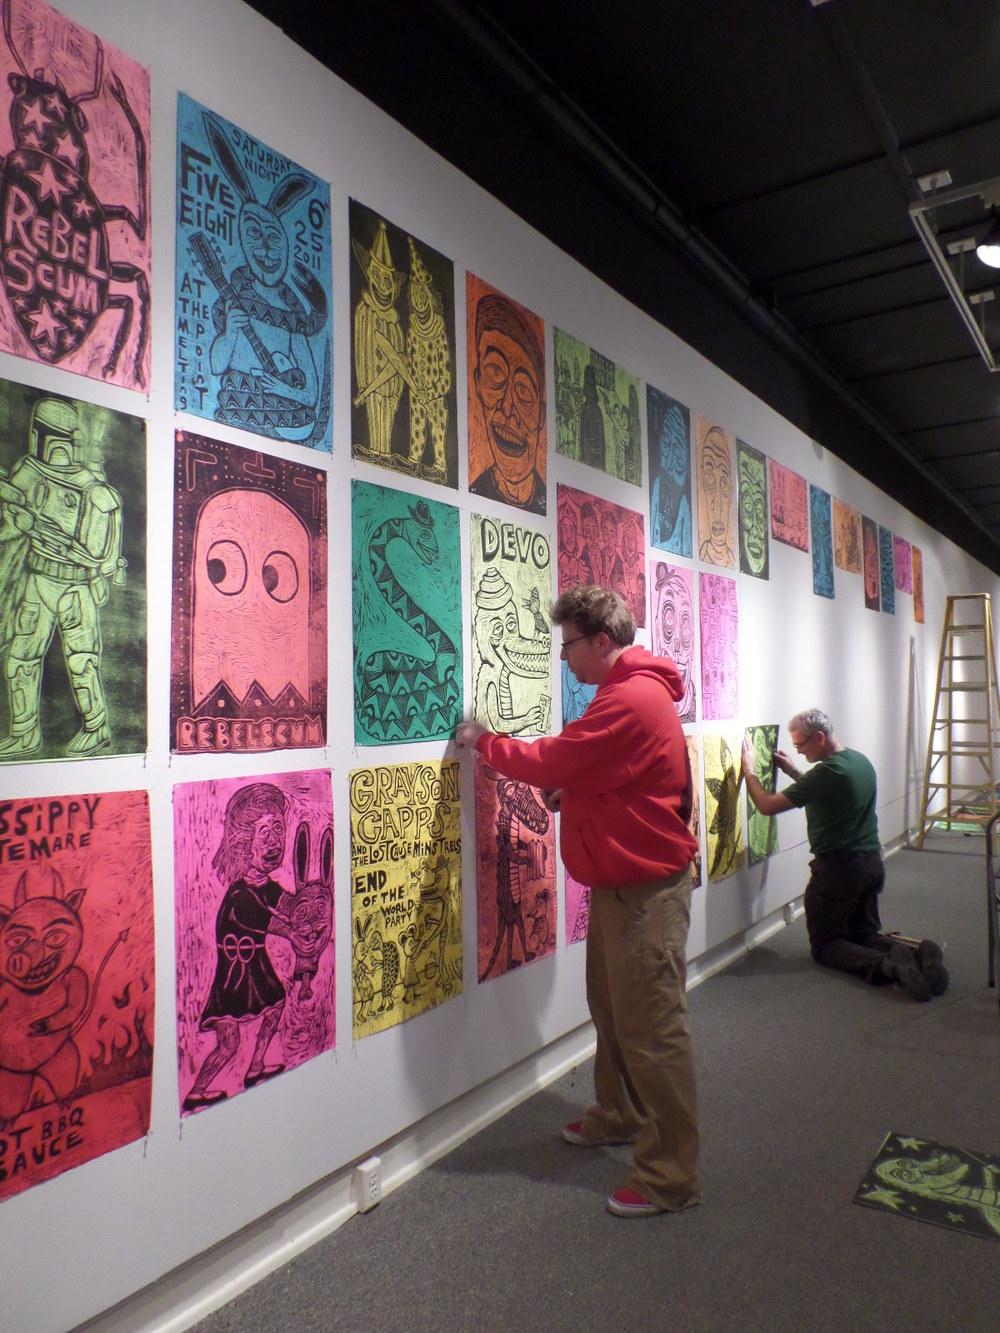 Sean Starwars - January 2014 - Friends of the Algur Meadows Museum of Art at Centenary College in Shreveport, LA